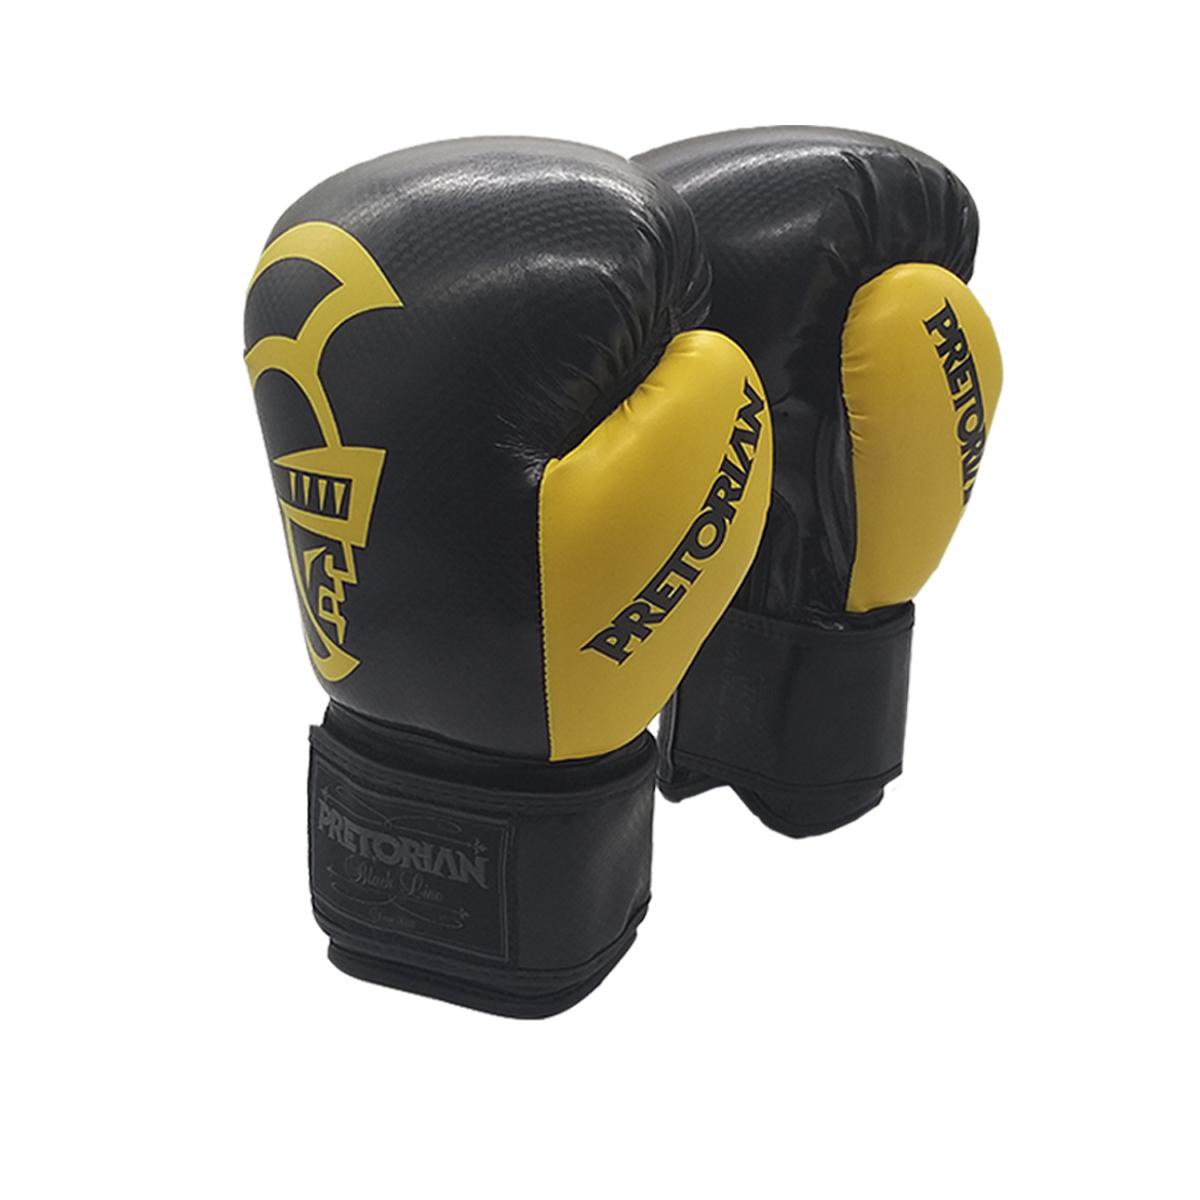 Luva De Boxe e Muay Thai Pretorian Black 14 Oz